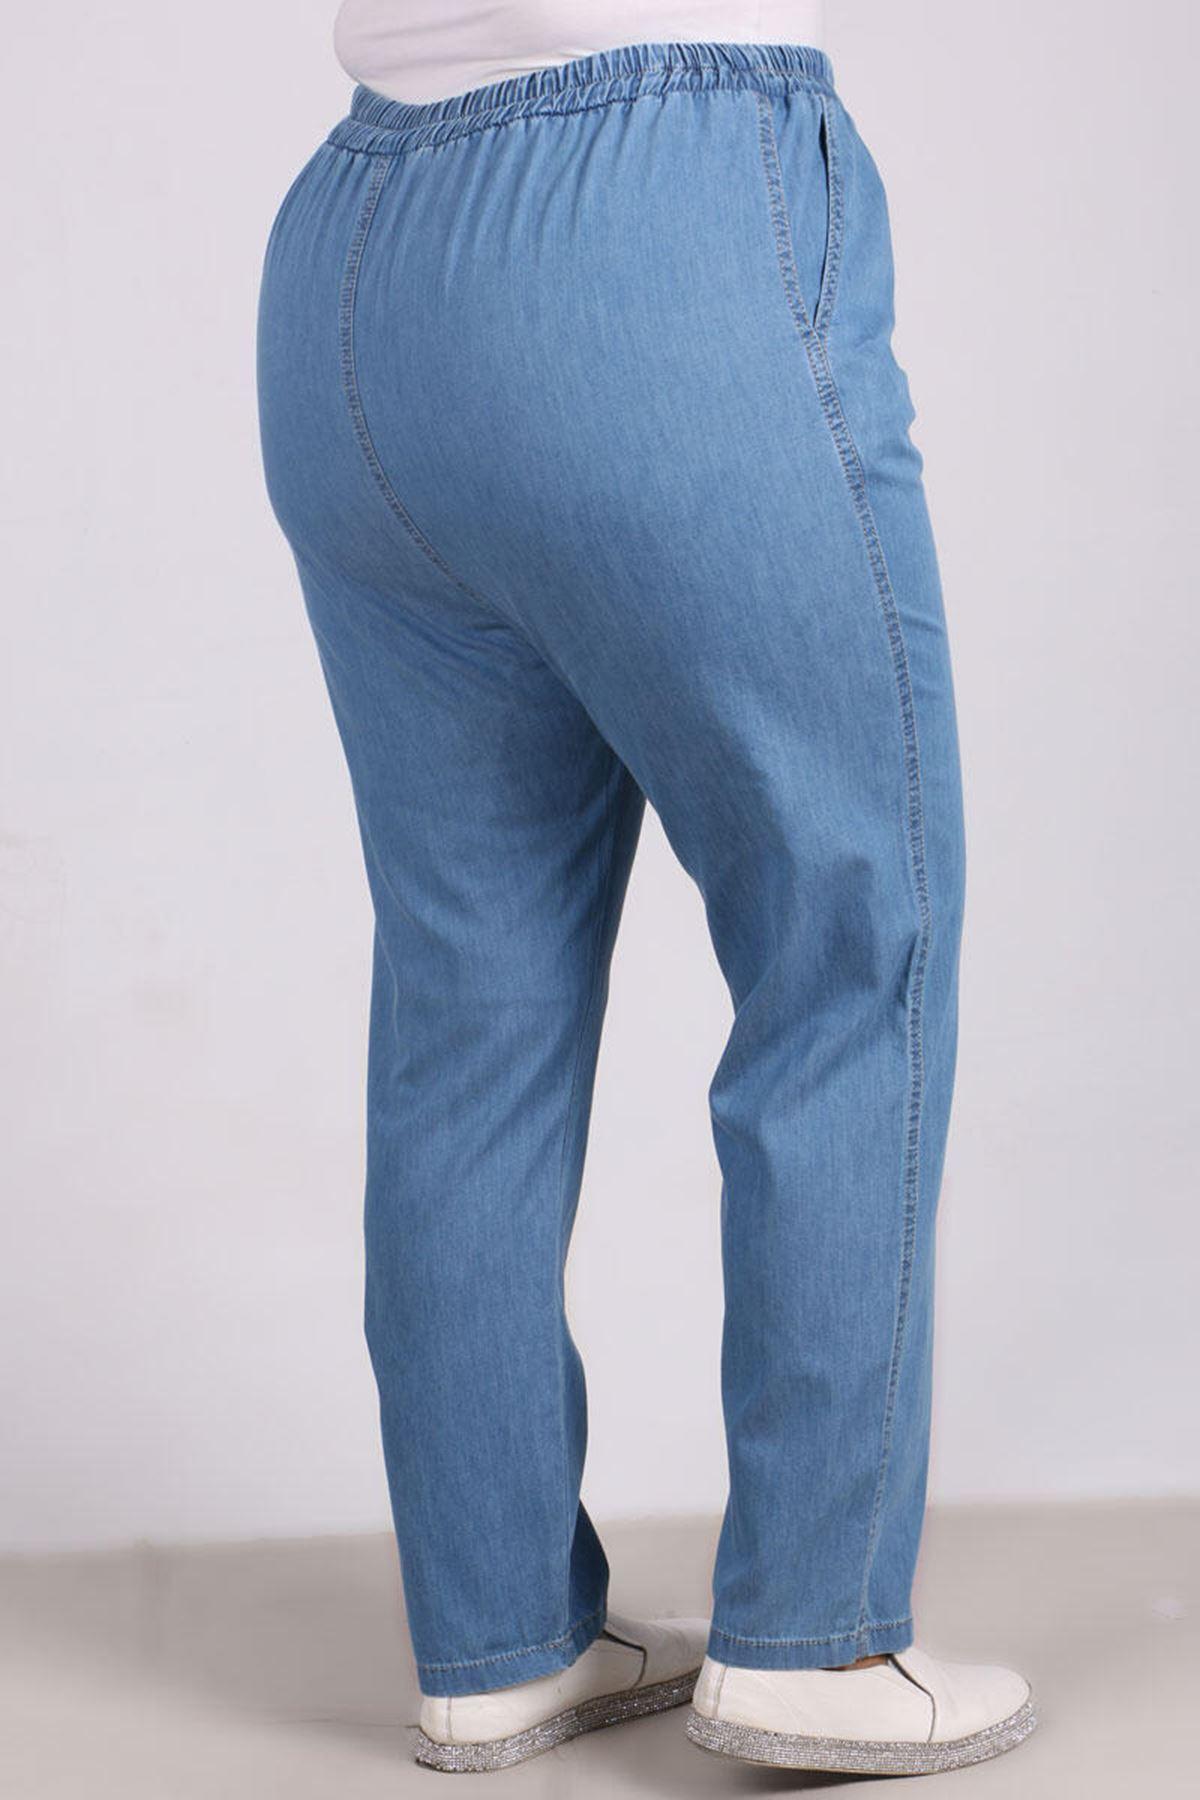 9123 Büyük Beden Beli Lastikli Dar Paça Kot Pantolon- Buz Mavi